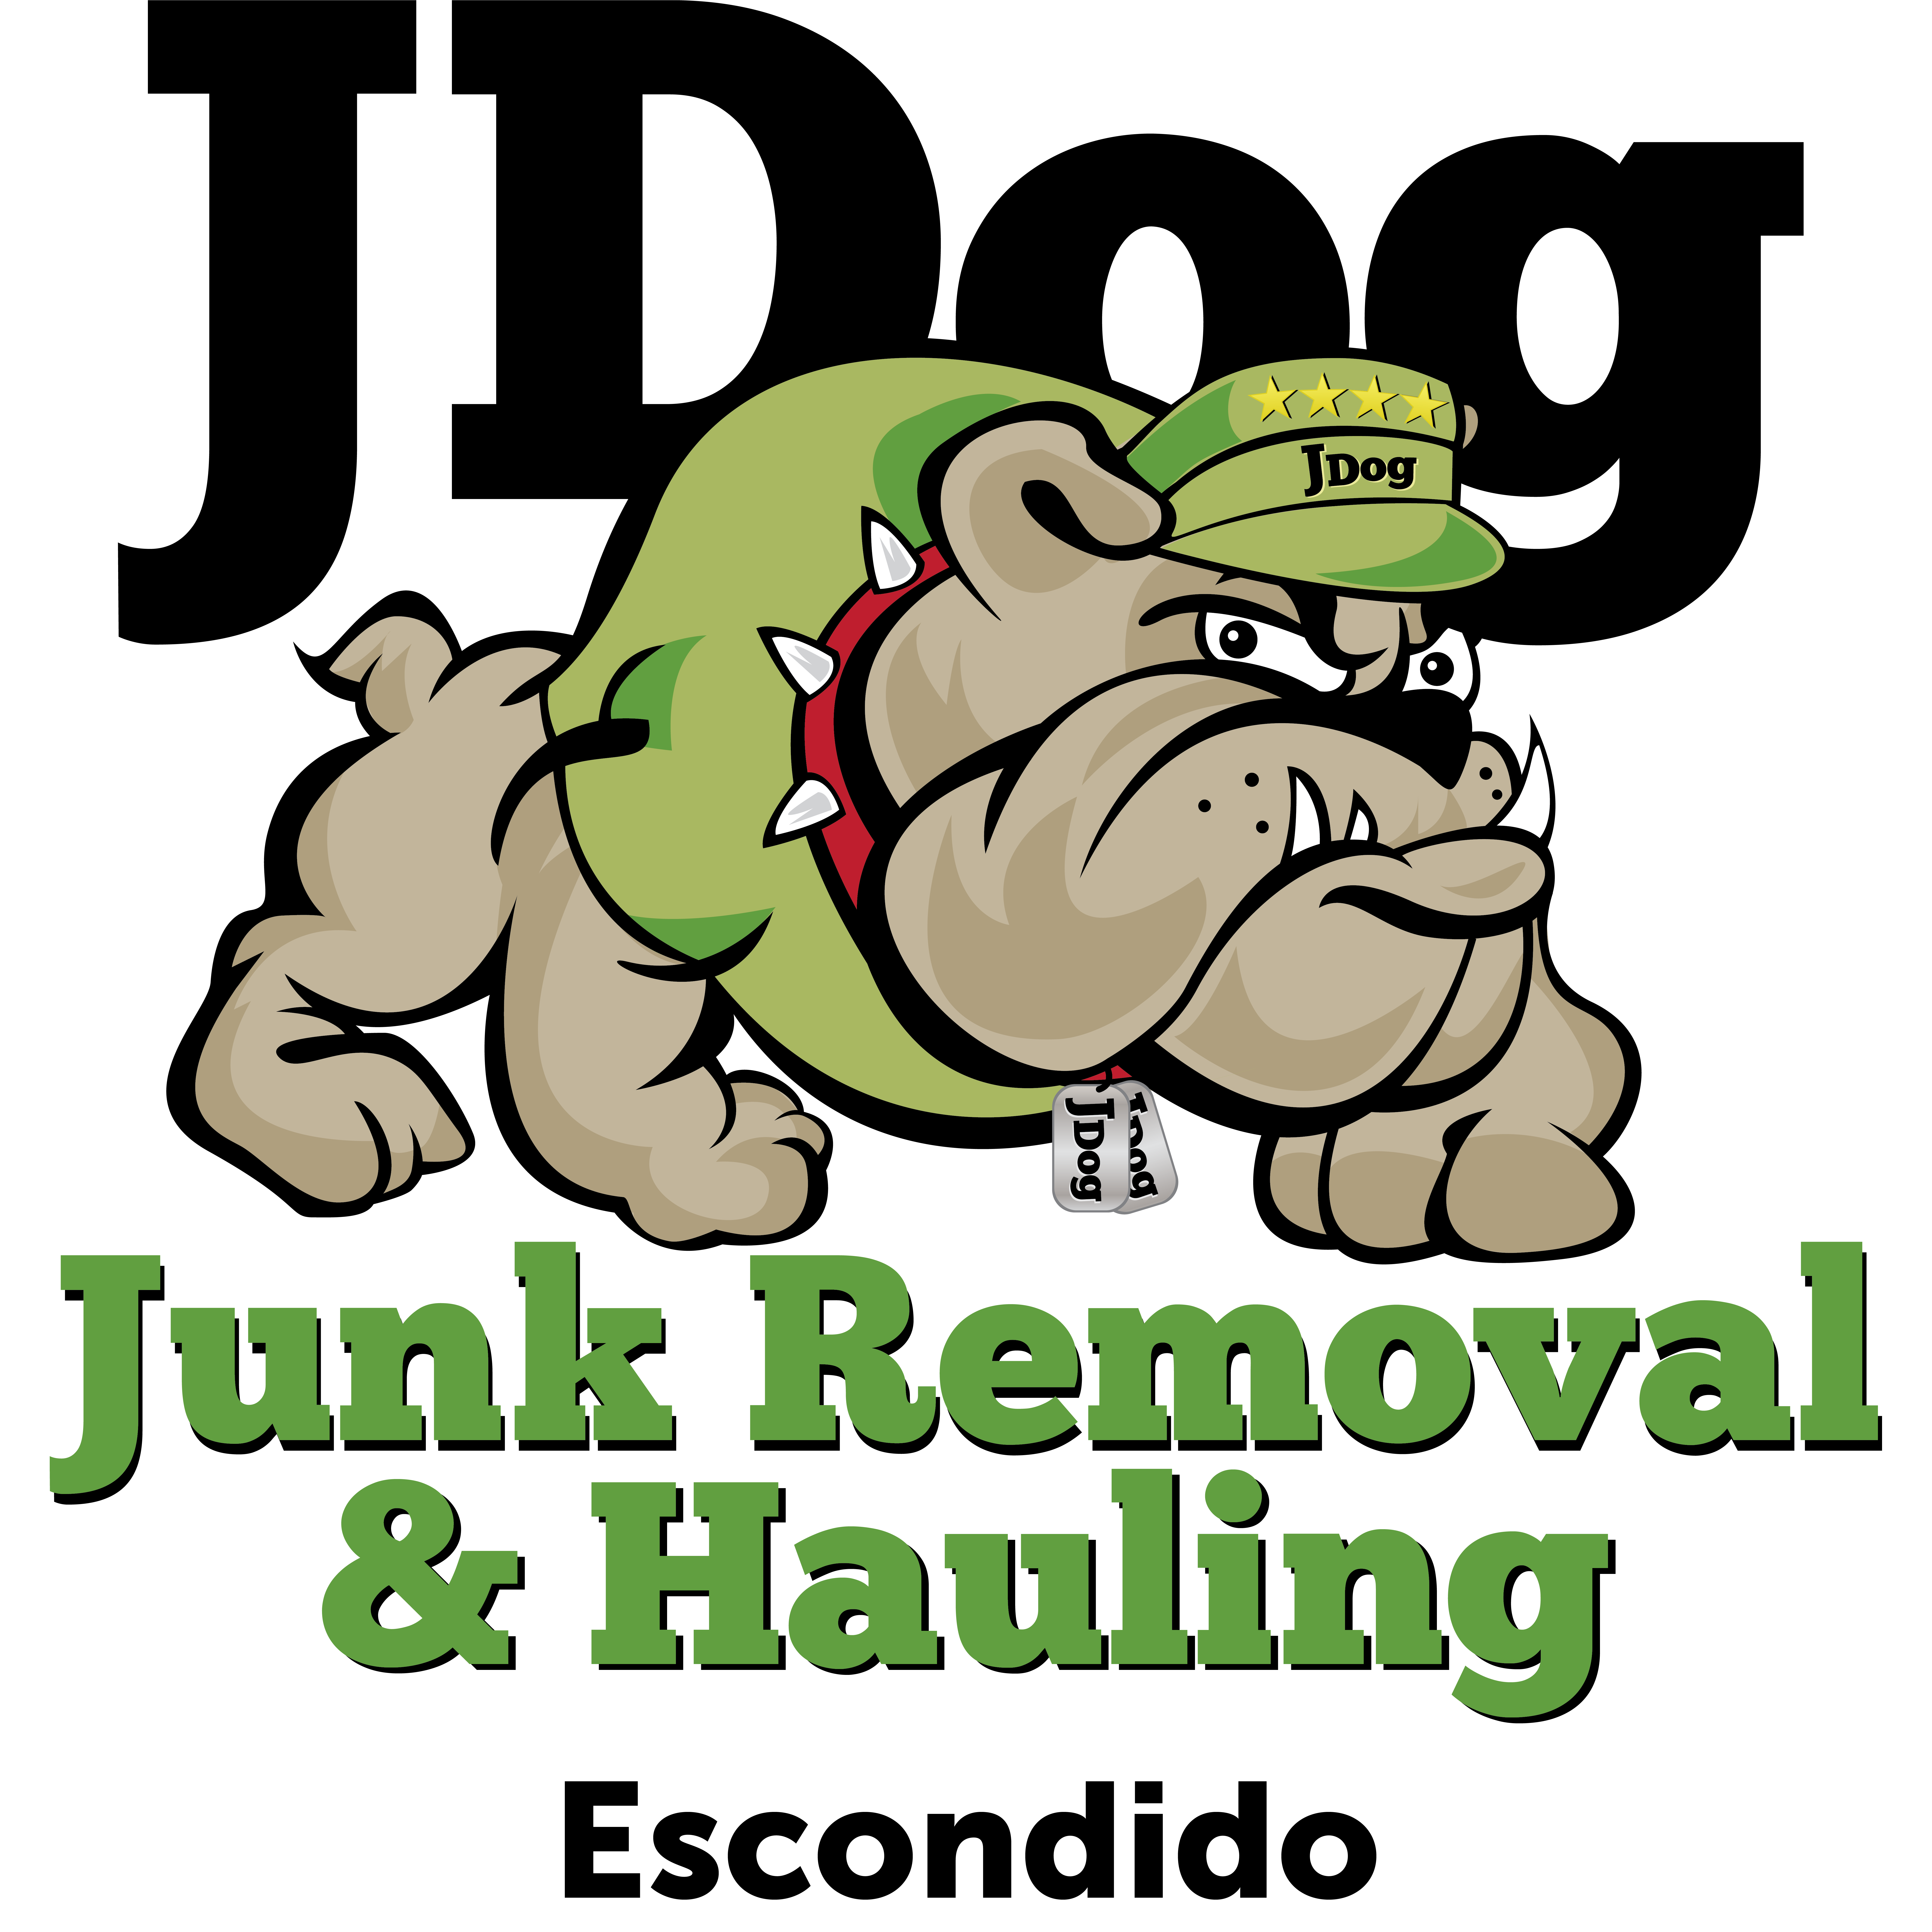 JDog Junk Removal & Hauling Escondido